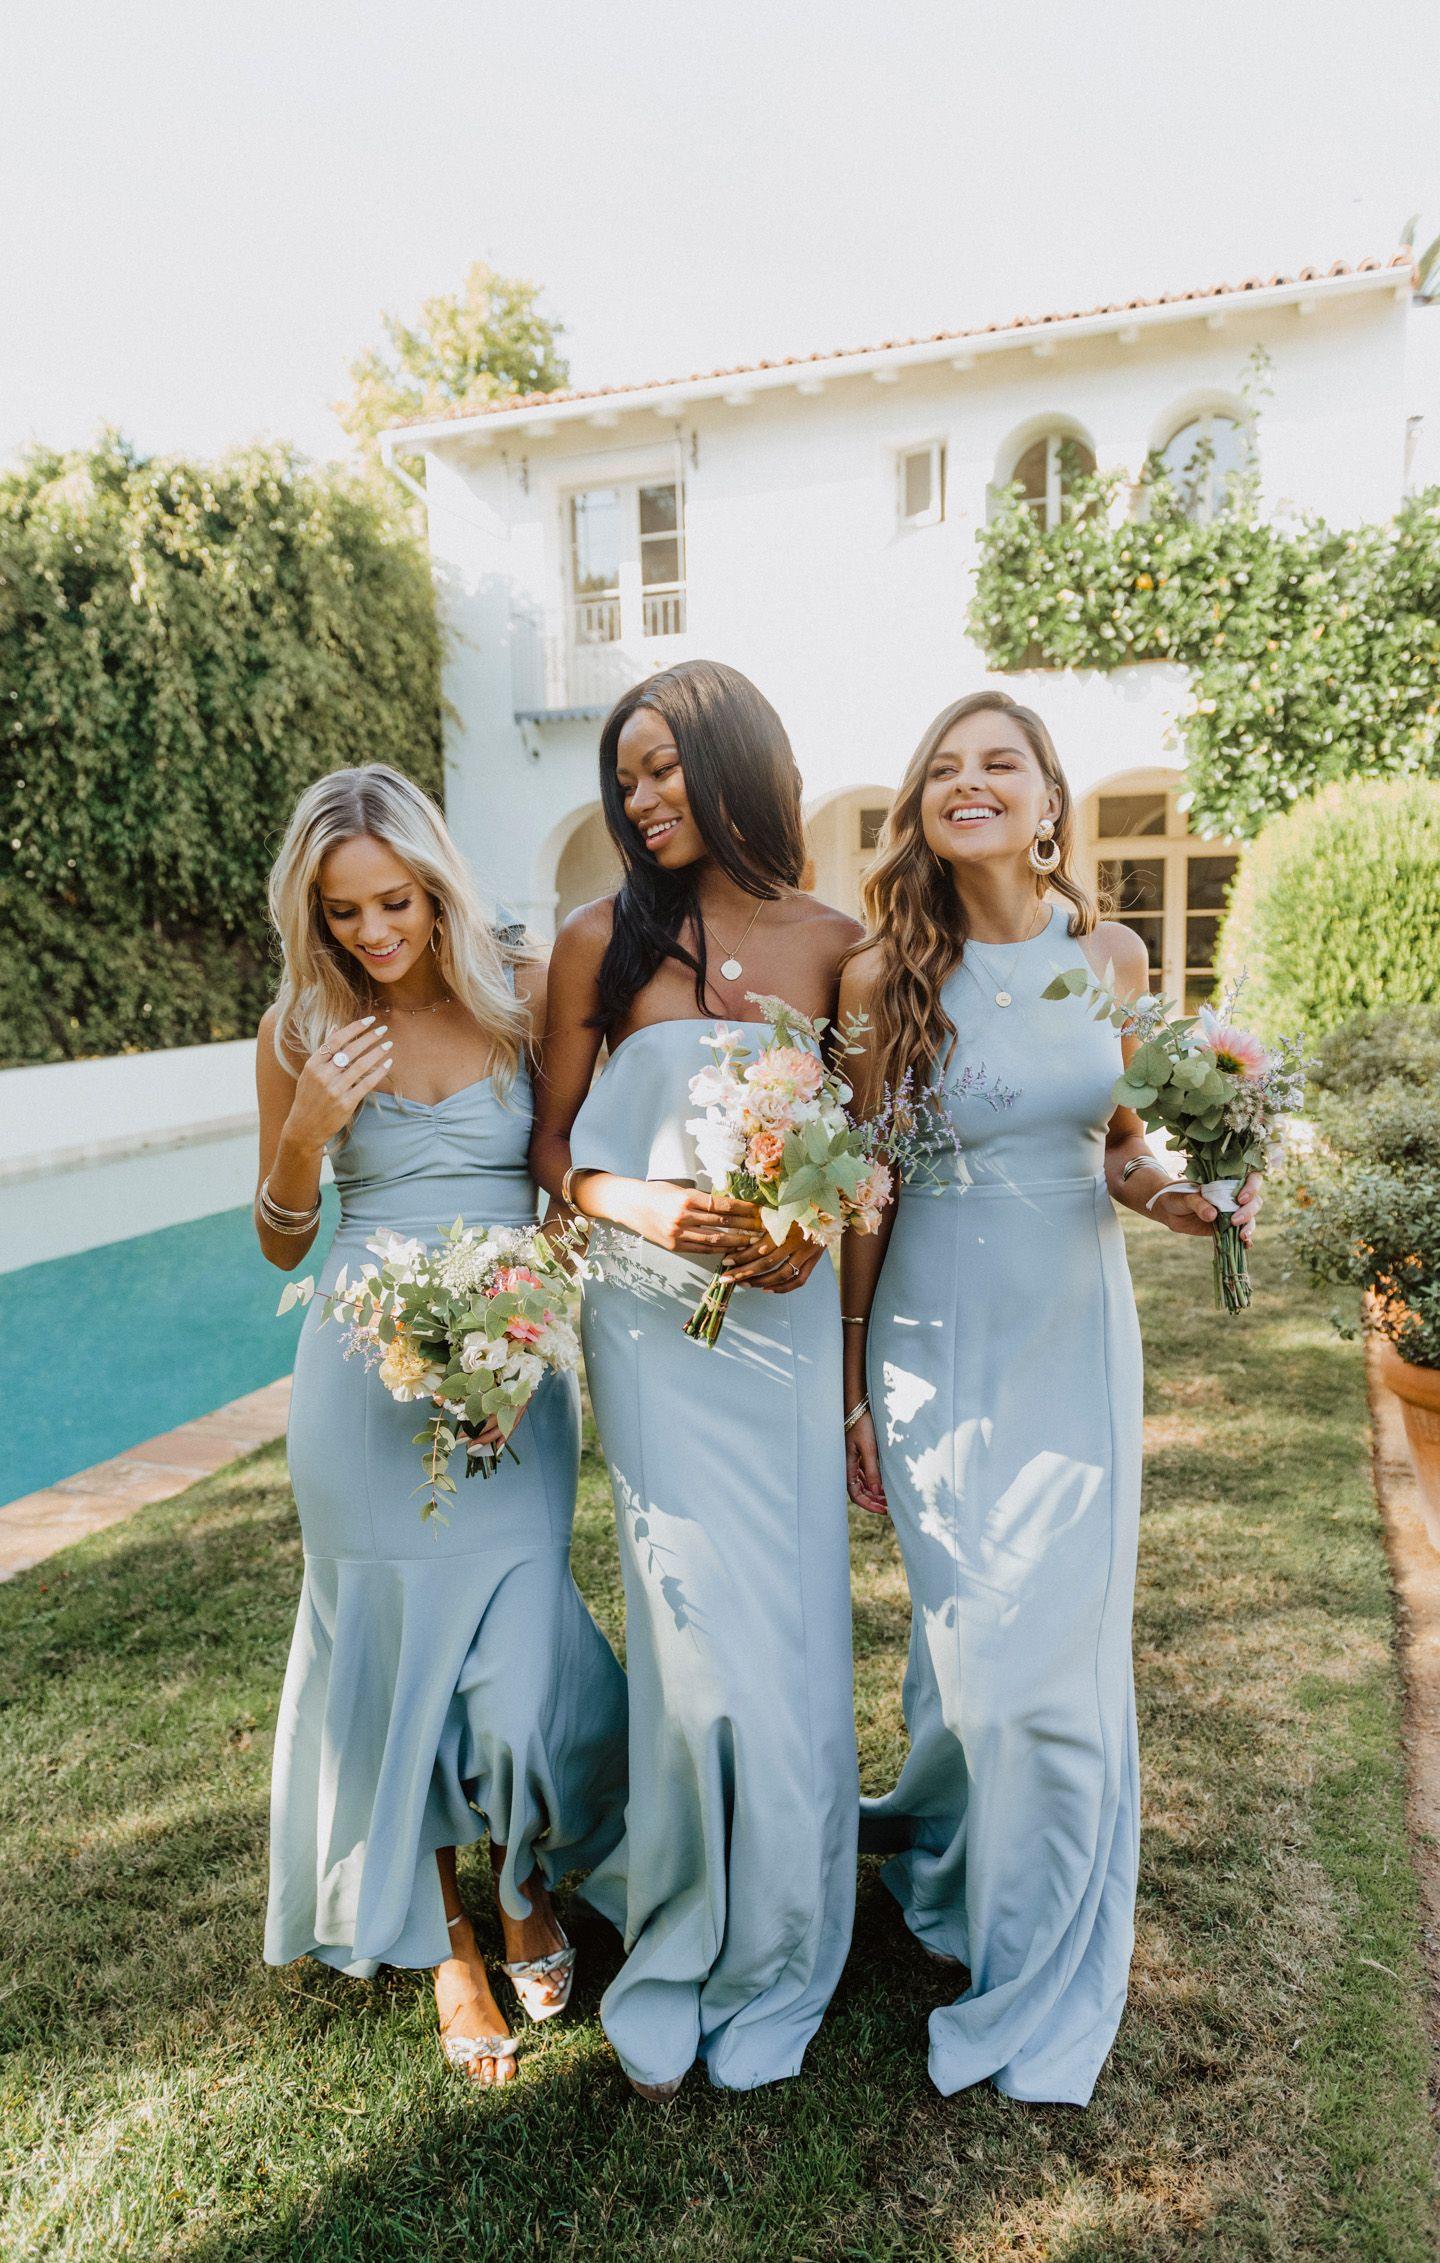 Show Me Your Mumu Mumu Weddings Spring Bridal 2020 In 2020 Boho Style Wedding Wedding Guest Looks Bridesmaid